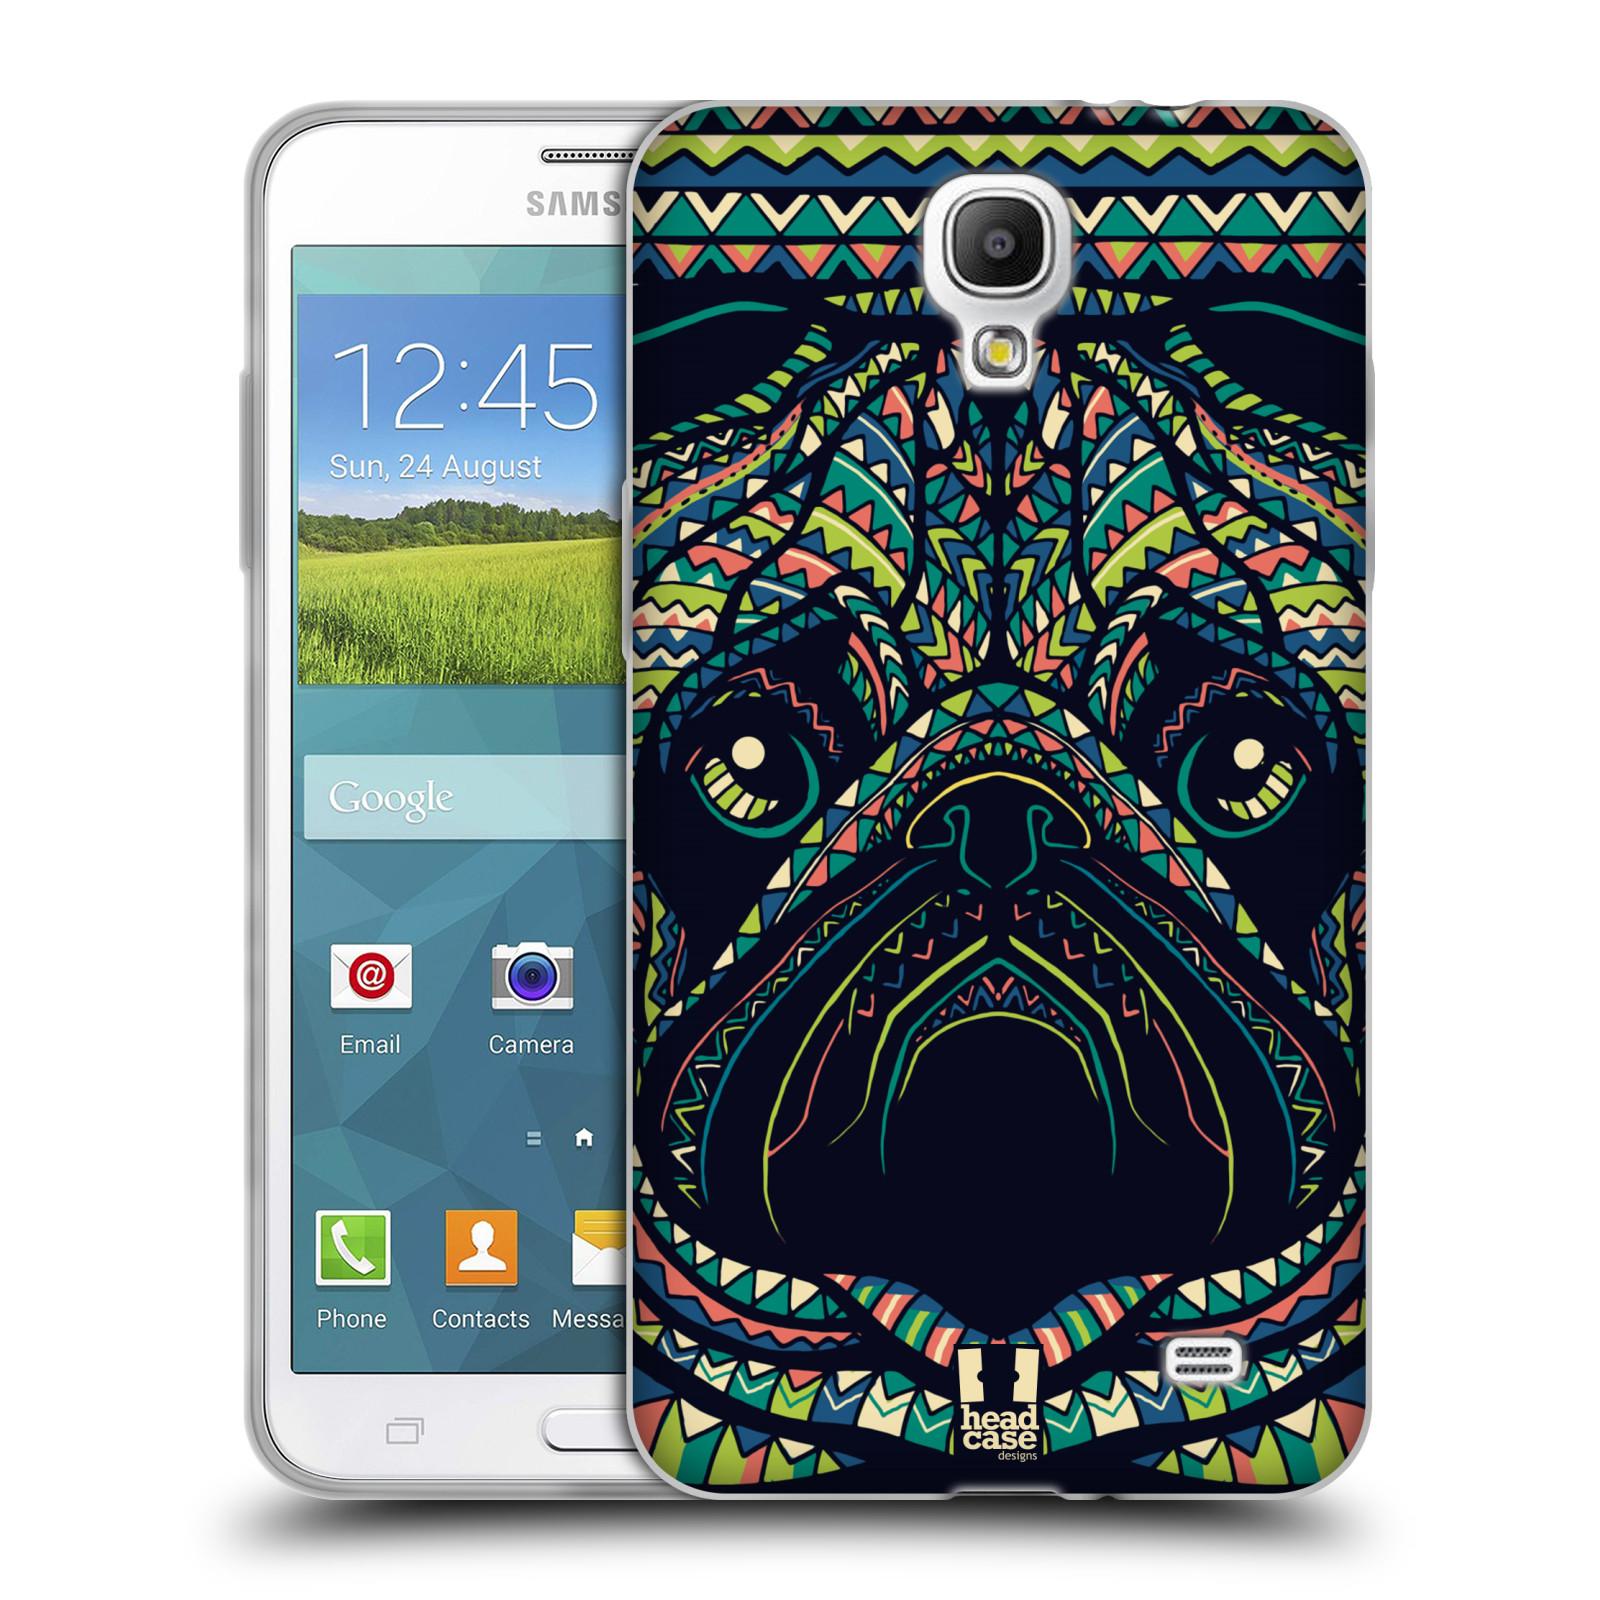 HEAD CASE silikonový obal na mobil Samsung Galaxy Mega 2 vzor Aztécký motiv zvíře 3 mopsík